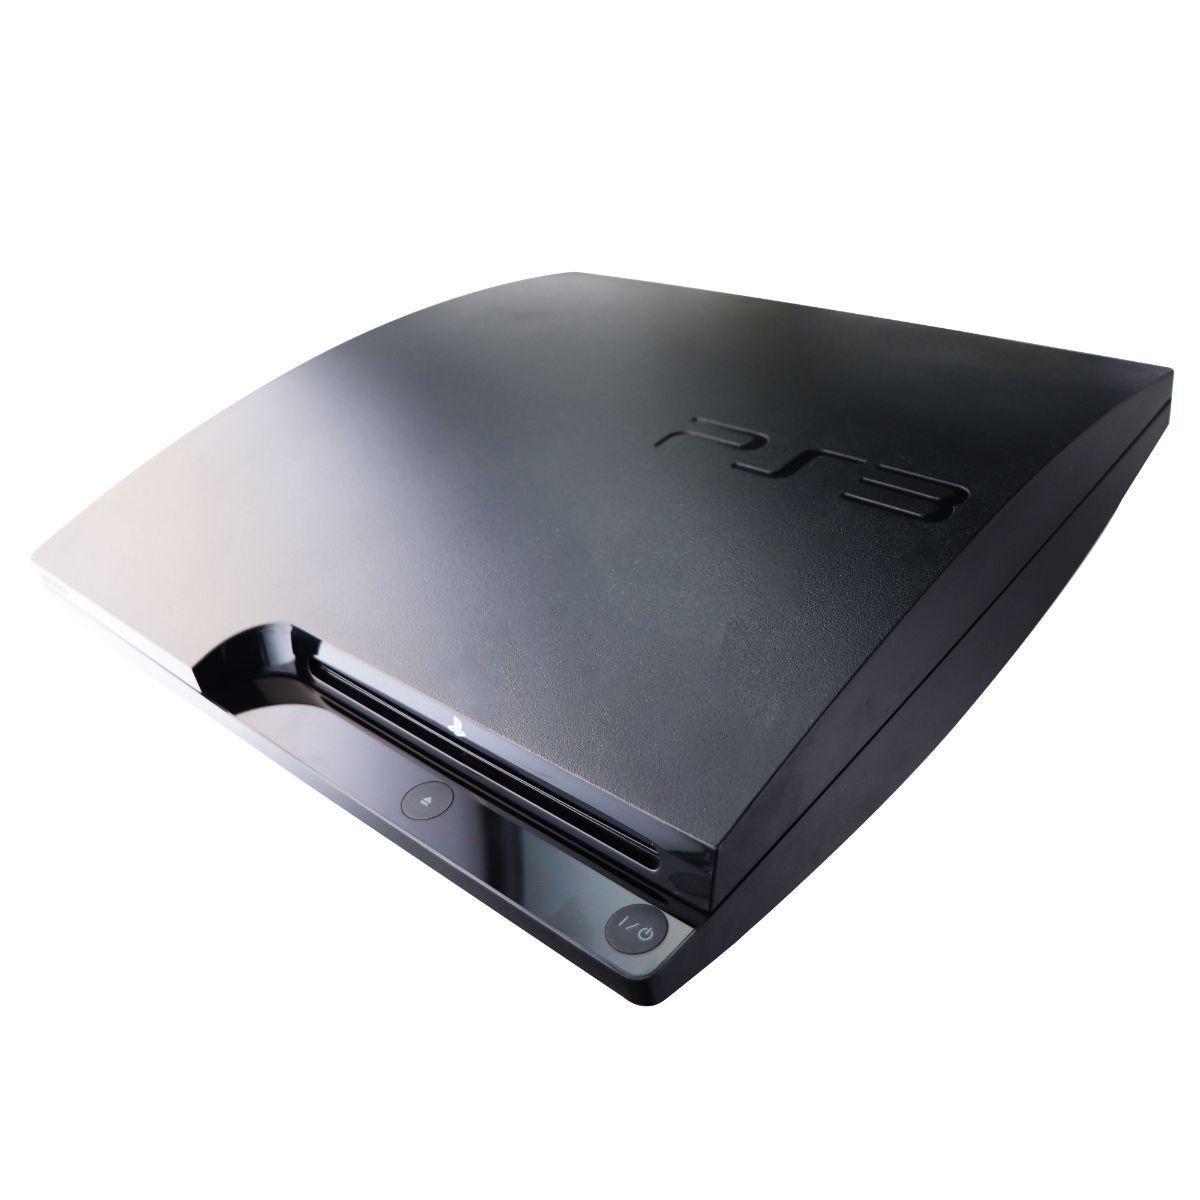 Sony PlayStation 3 Slim PS3 (320GB) Gaming Console - Black (CECH-3001B)